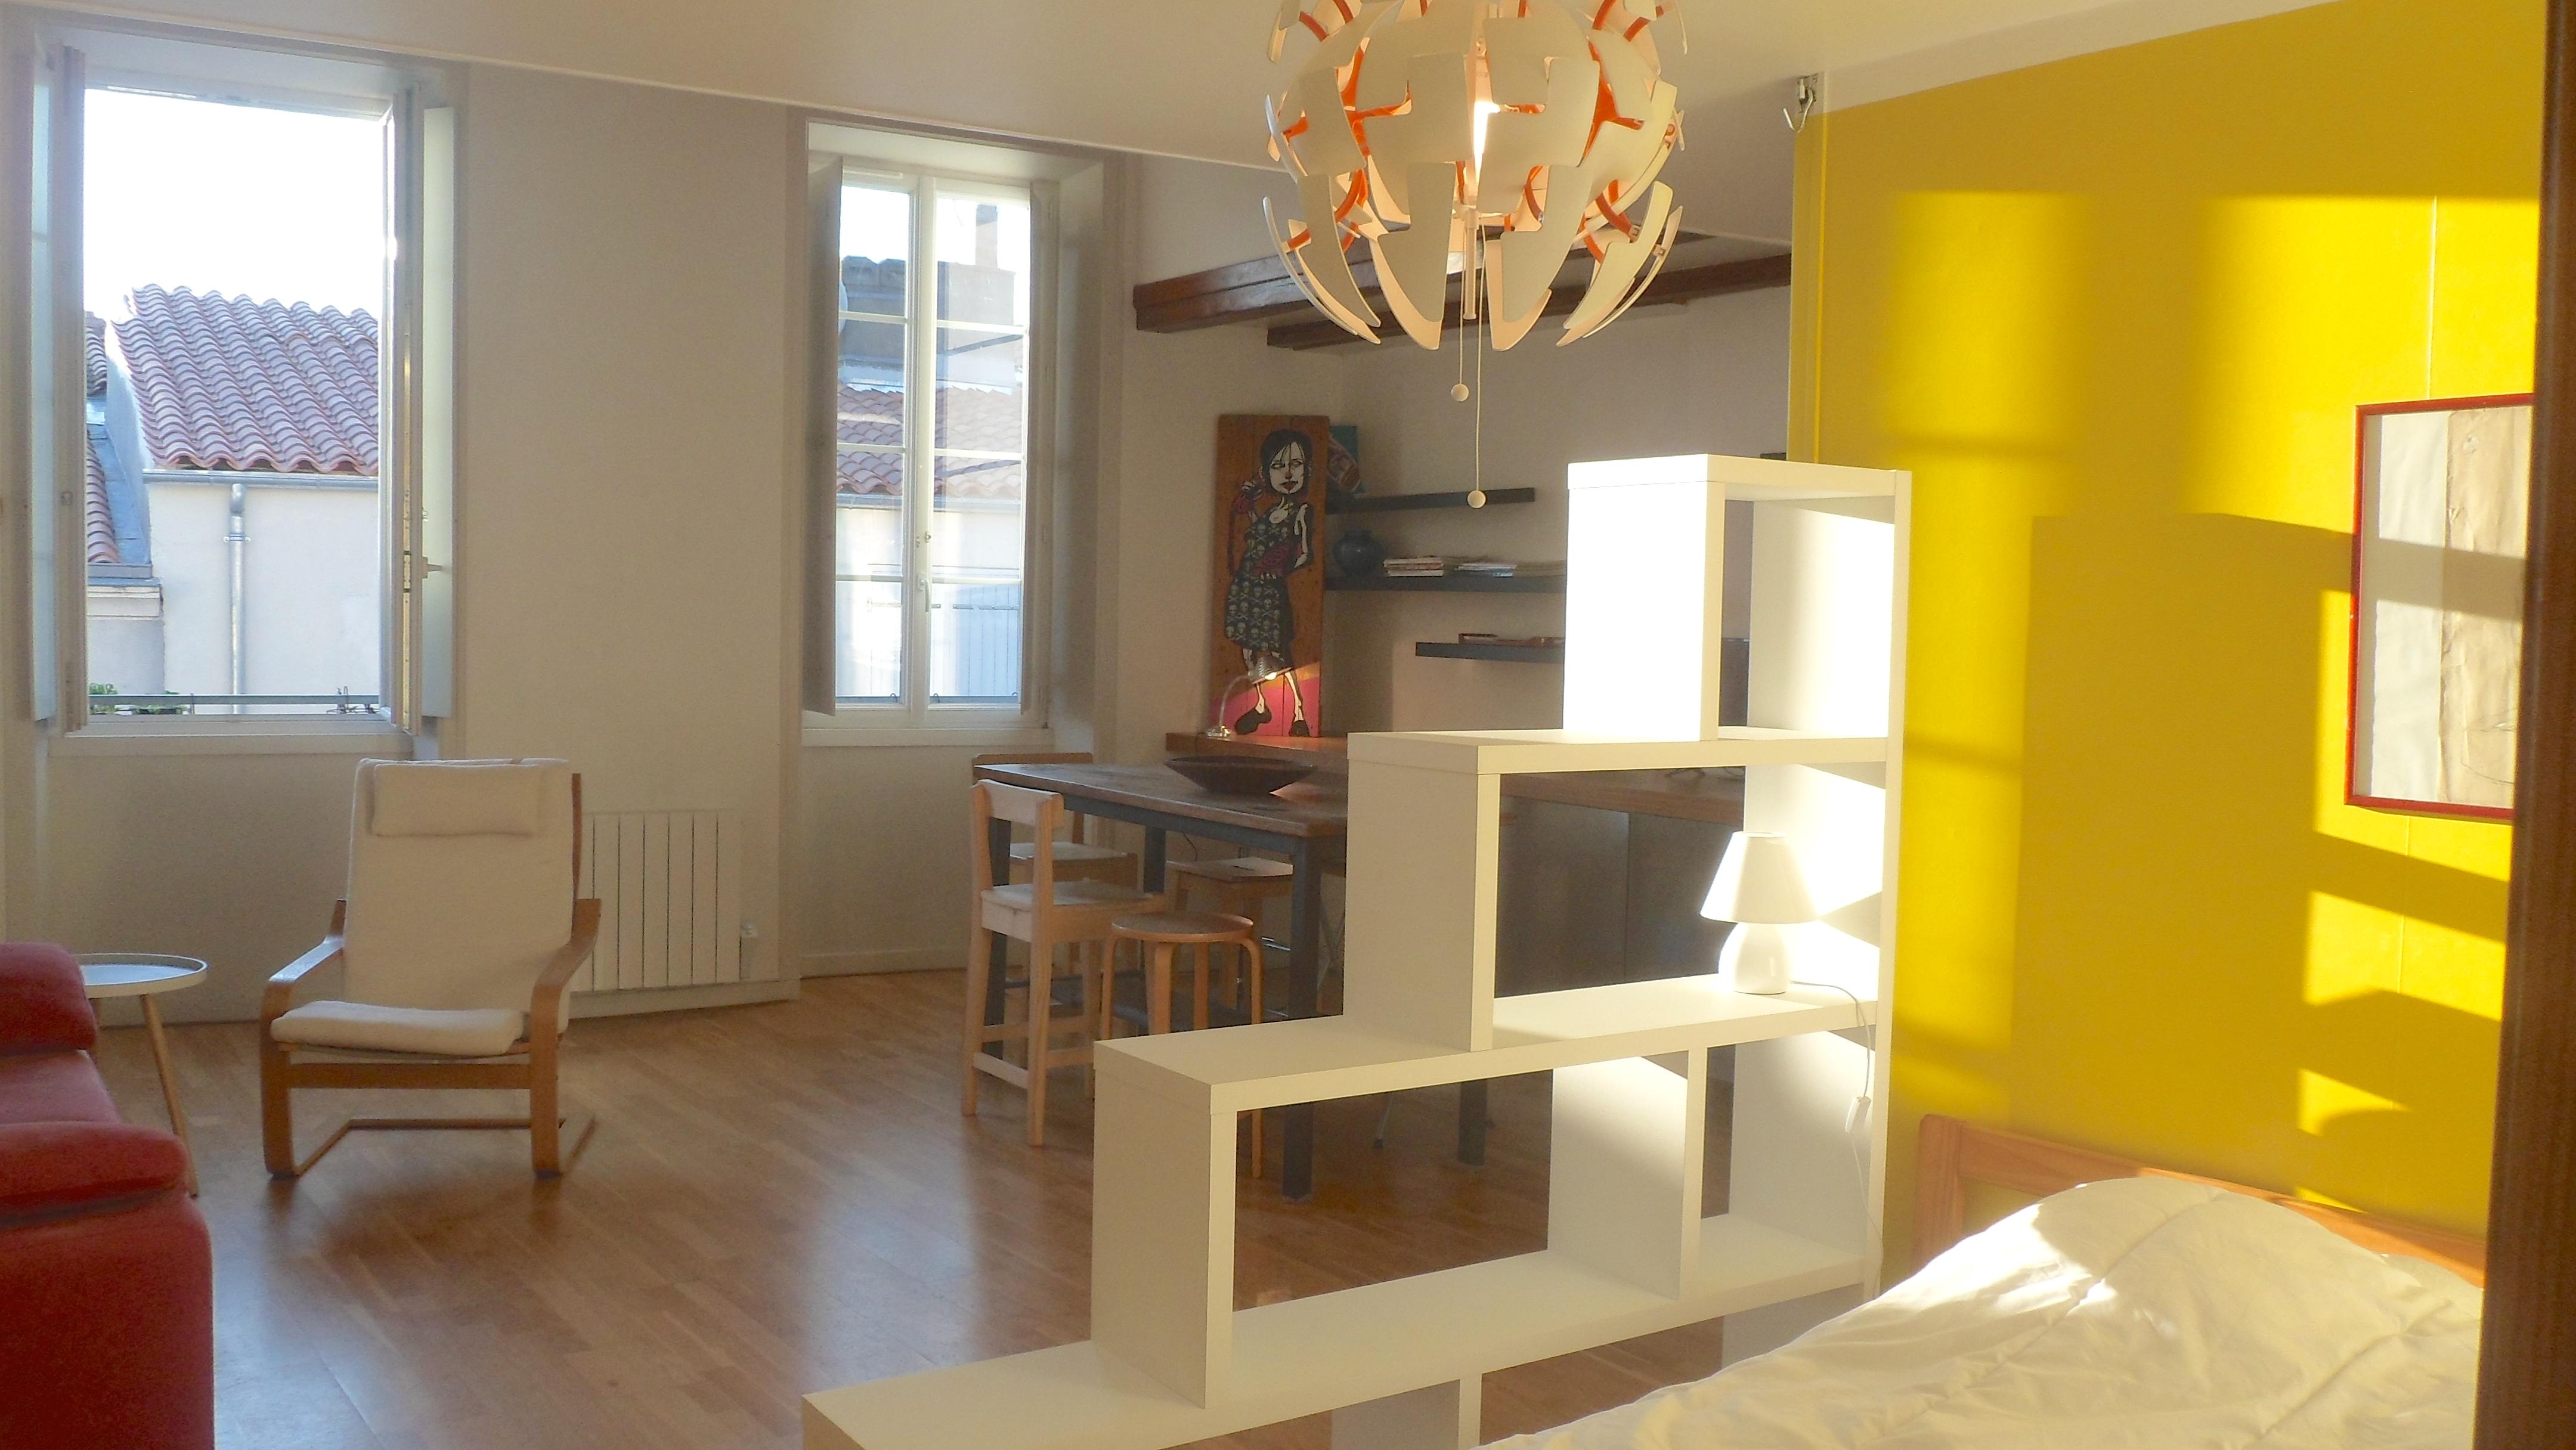 l 39 atelier appart la rochelle. Black Bedroom Furniture Sets. Home Design Ideas